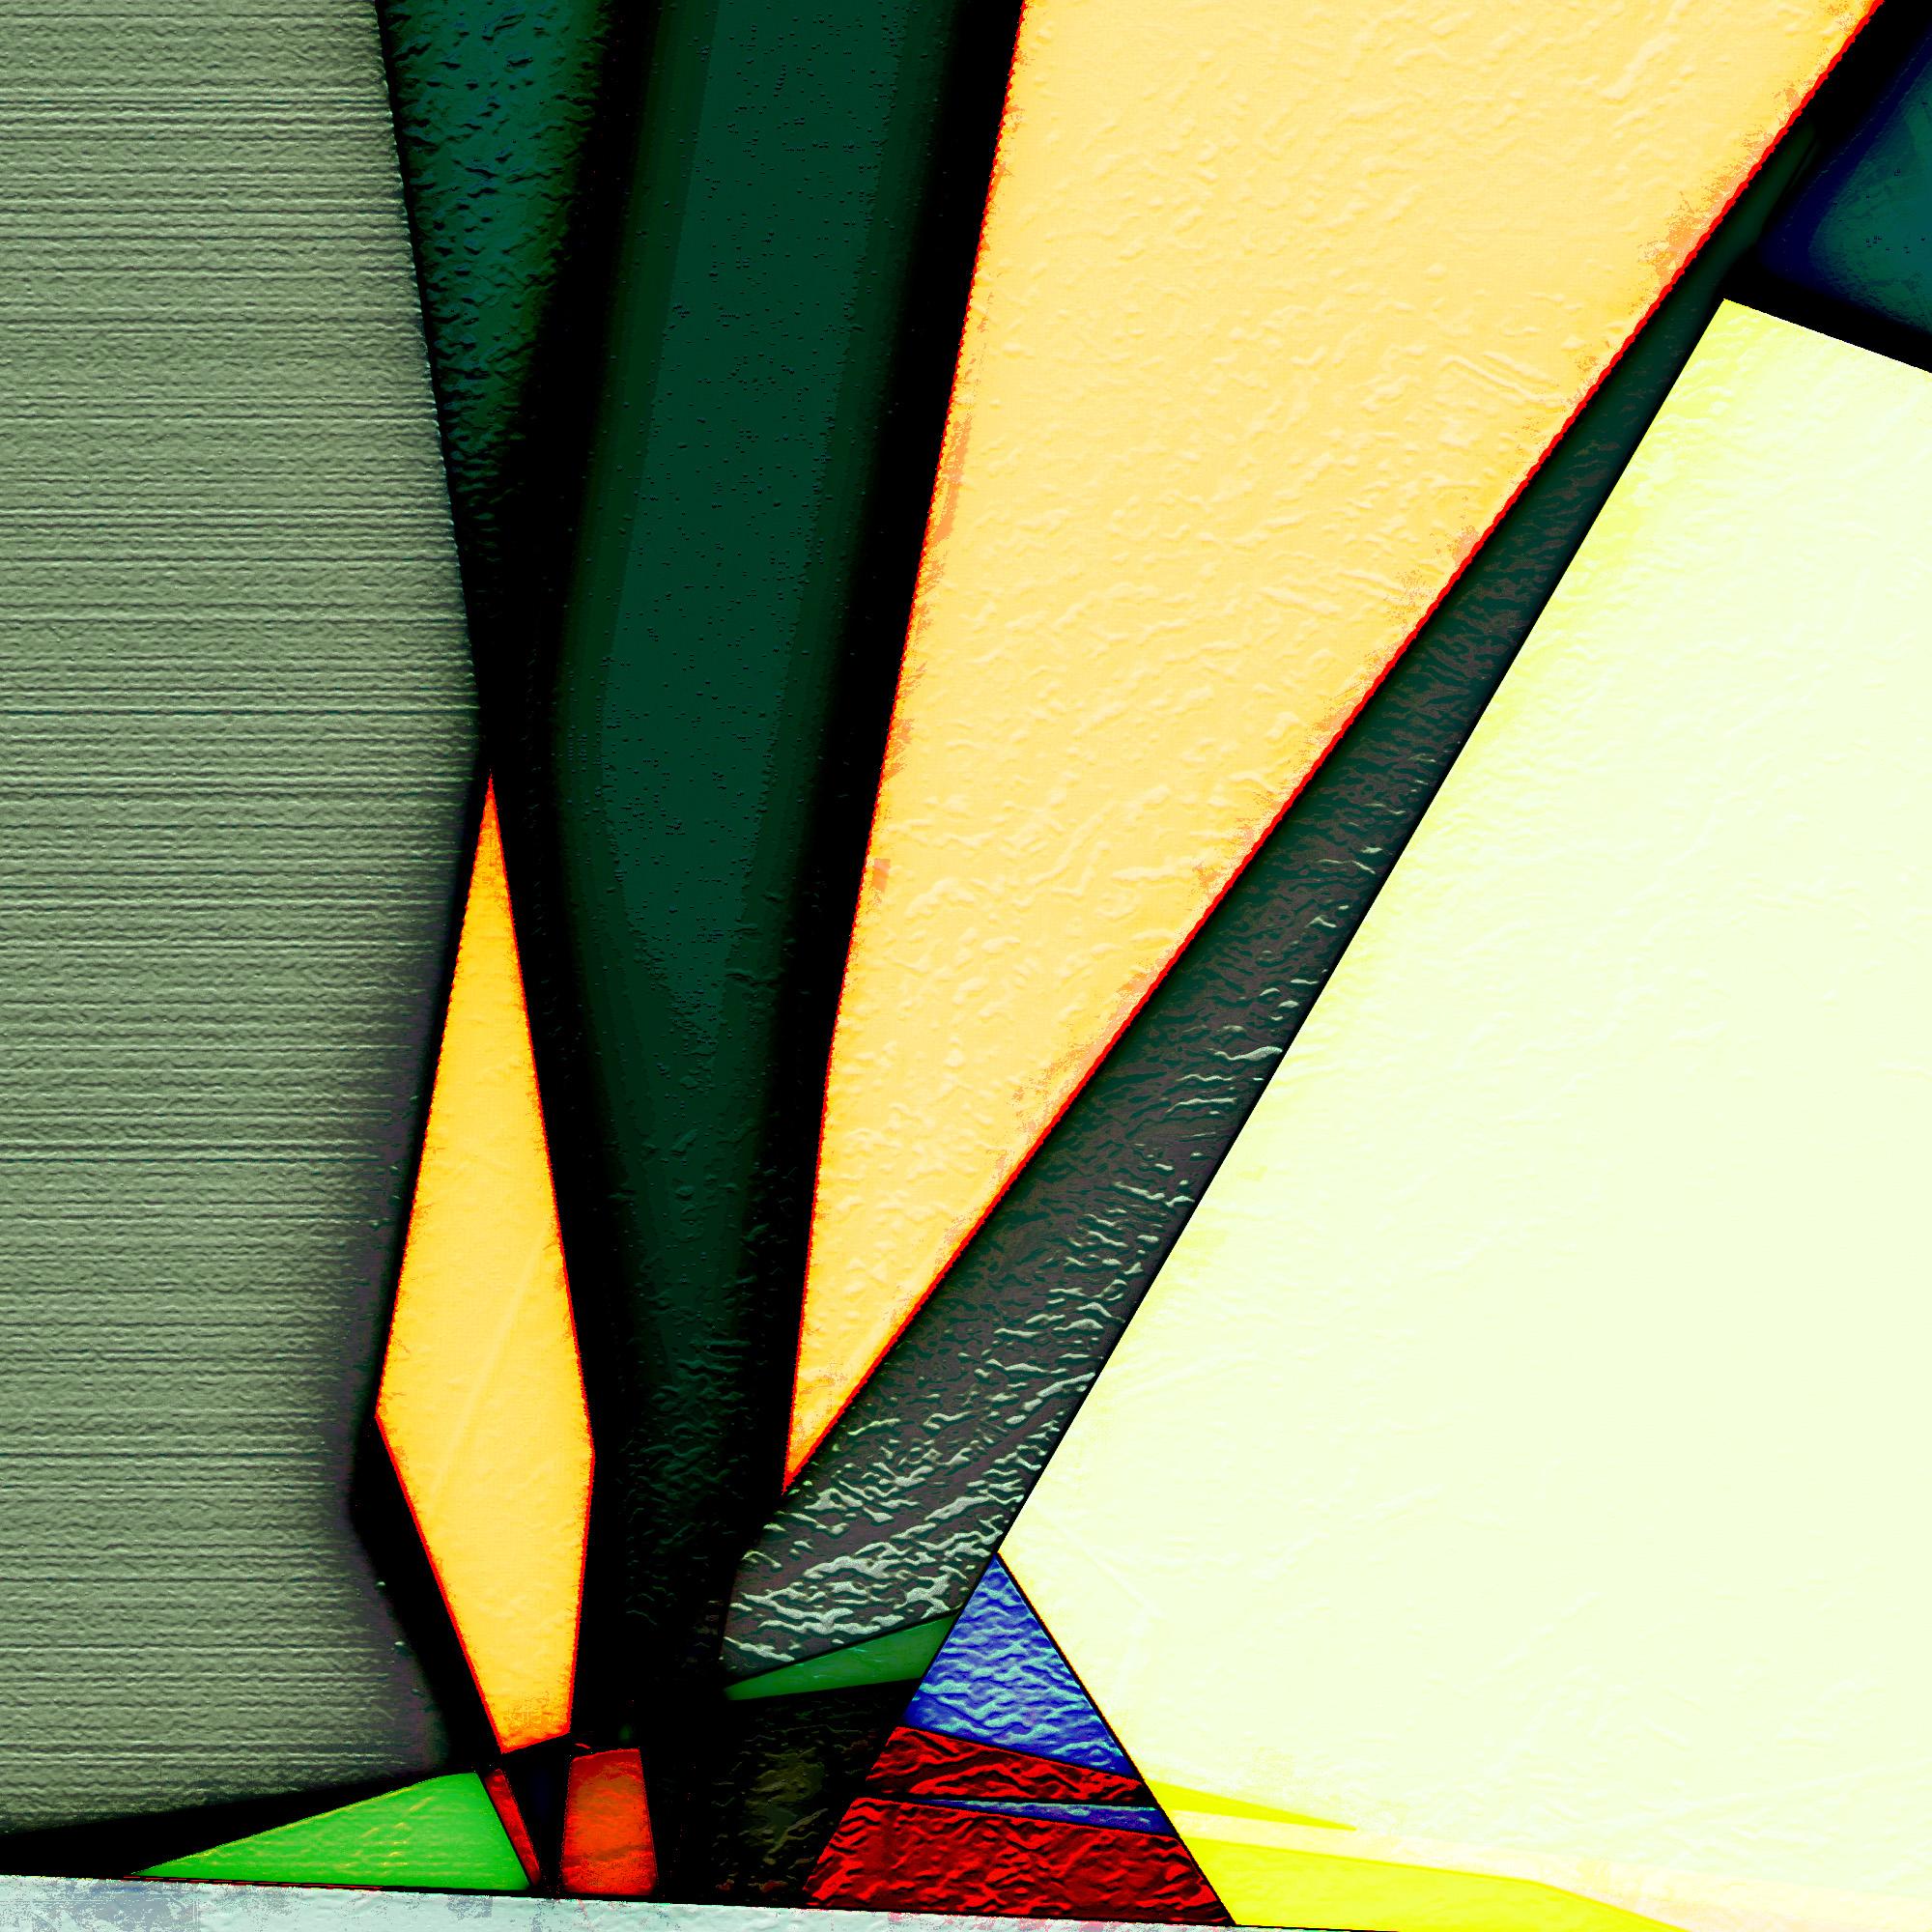 180625_My_Version_Detail1.jpg